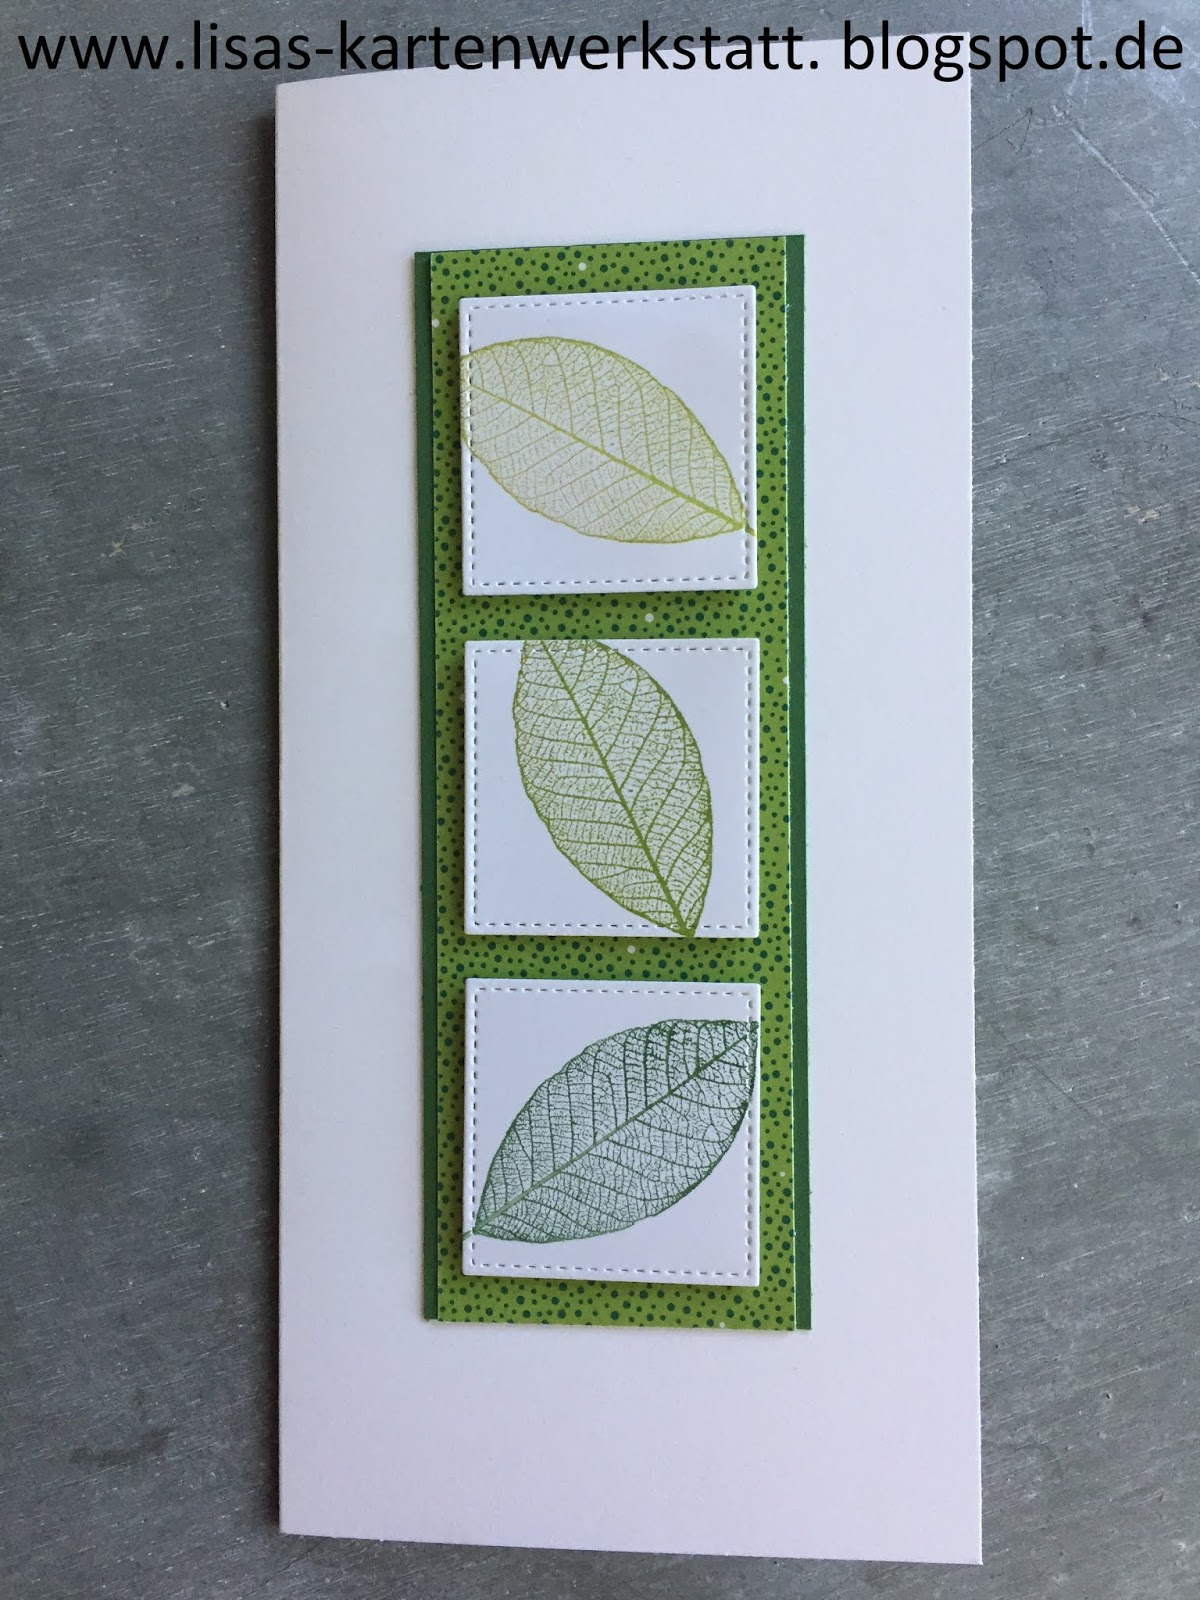 Lisas Kartenwerkstatt: Zarte Blätter